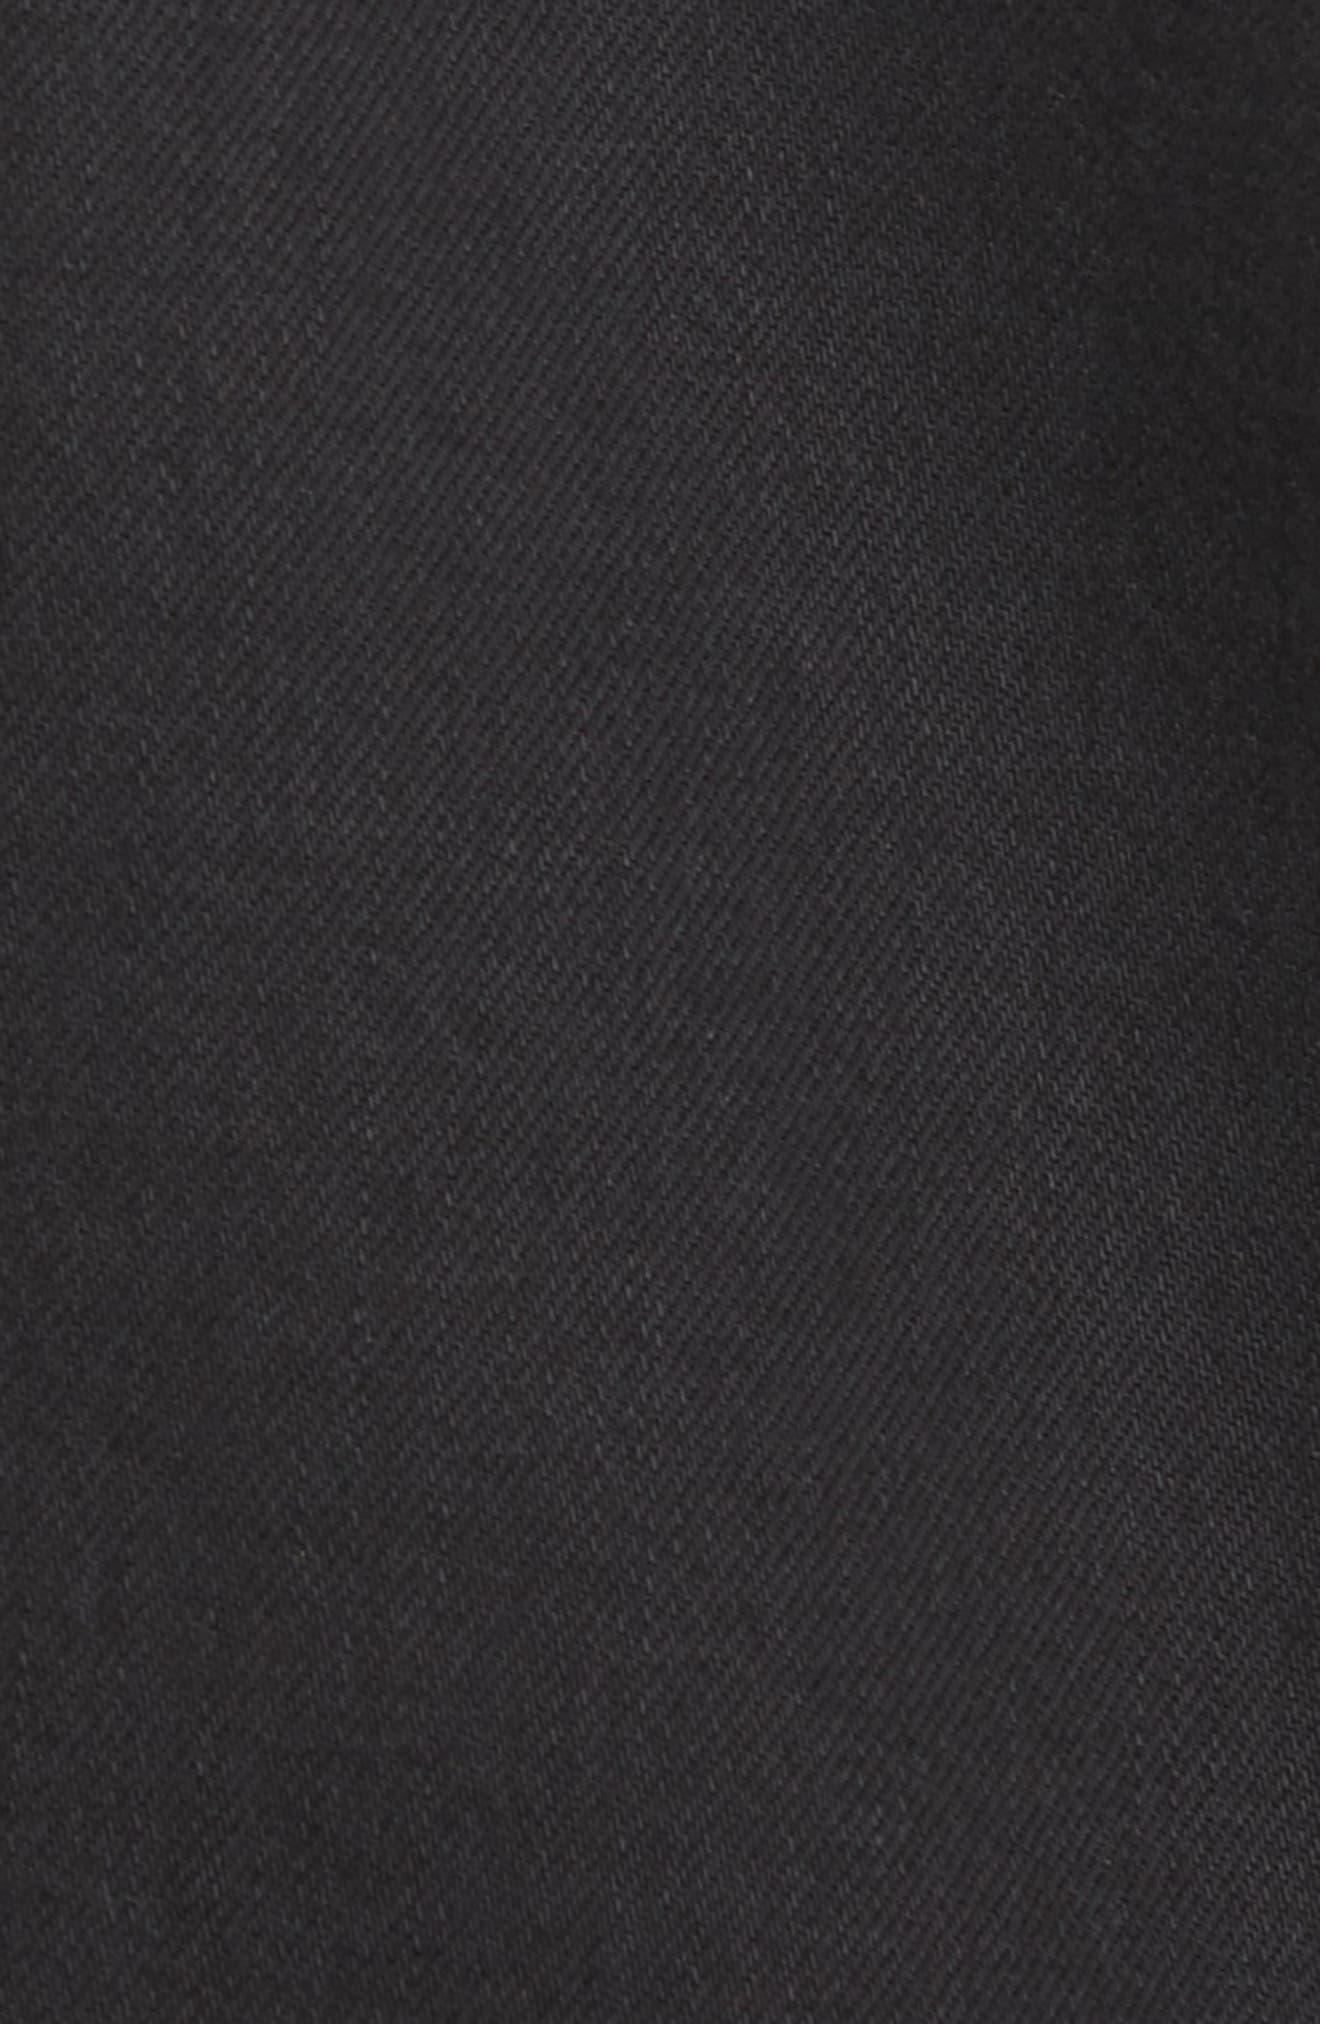 L'Homme Denim Jacket,                             Alternate thumbnail 6, color,                             001